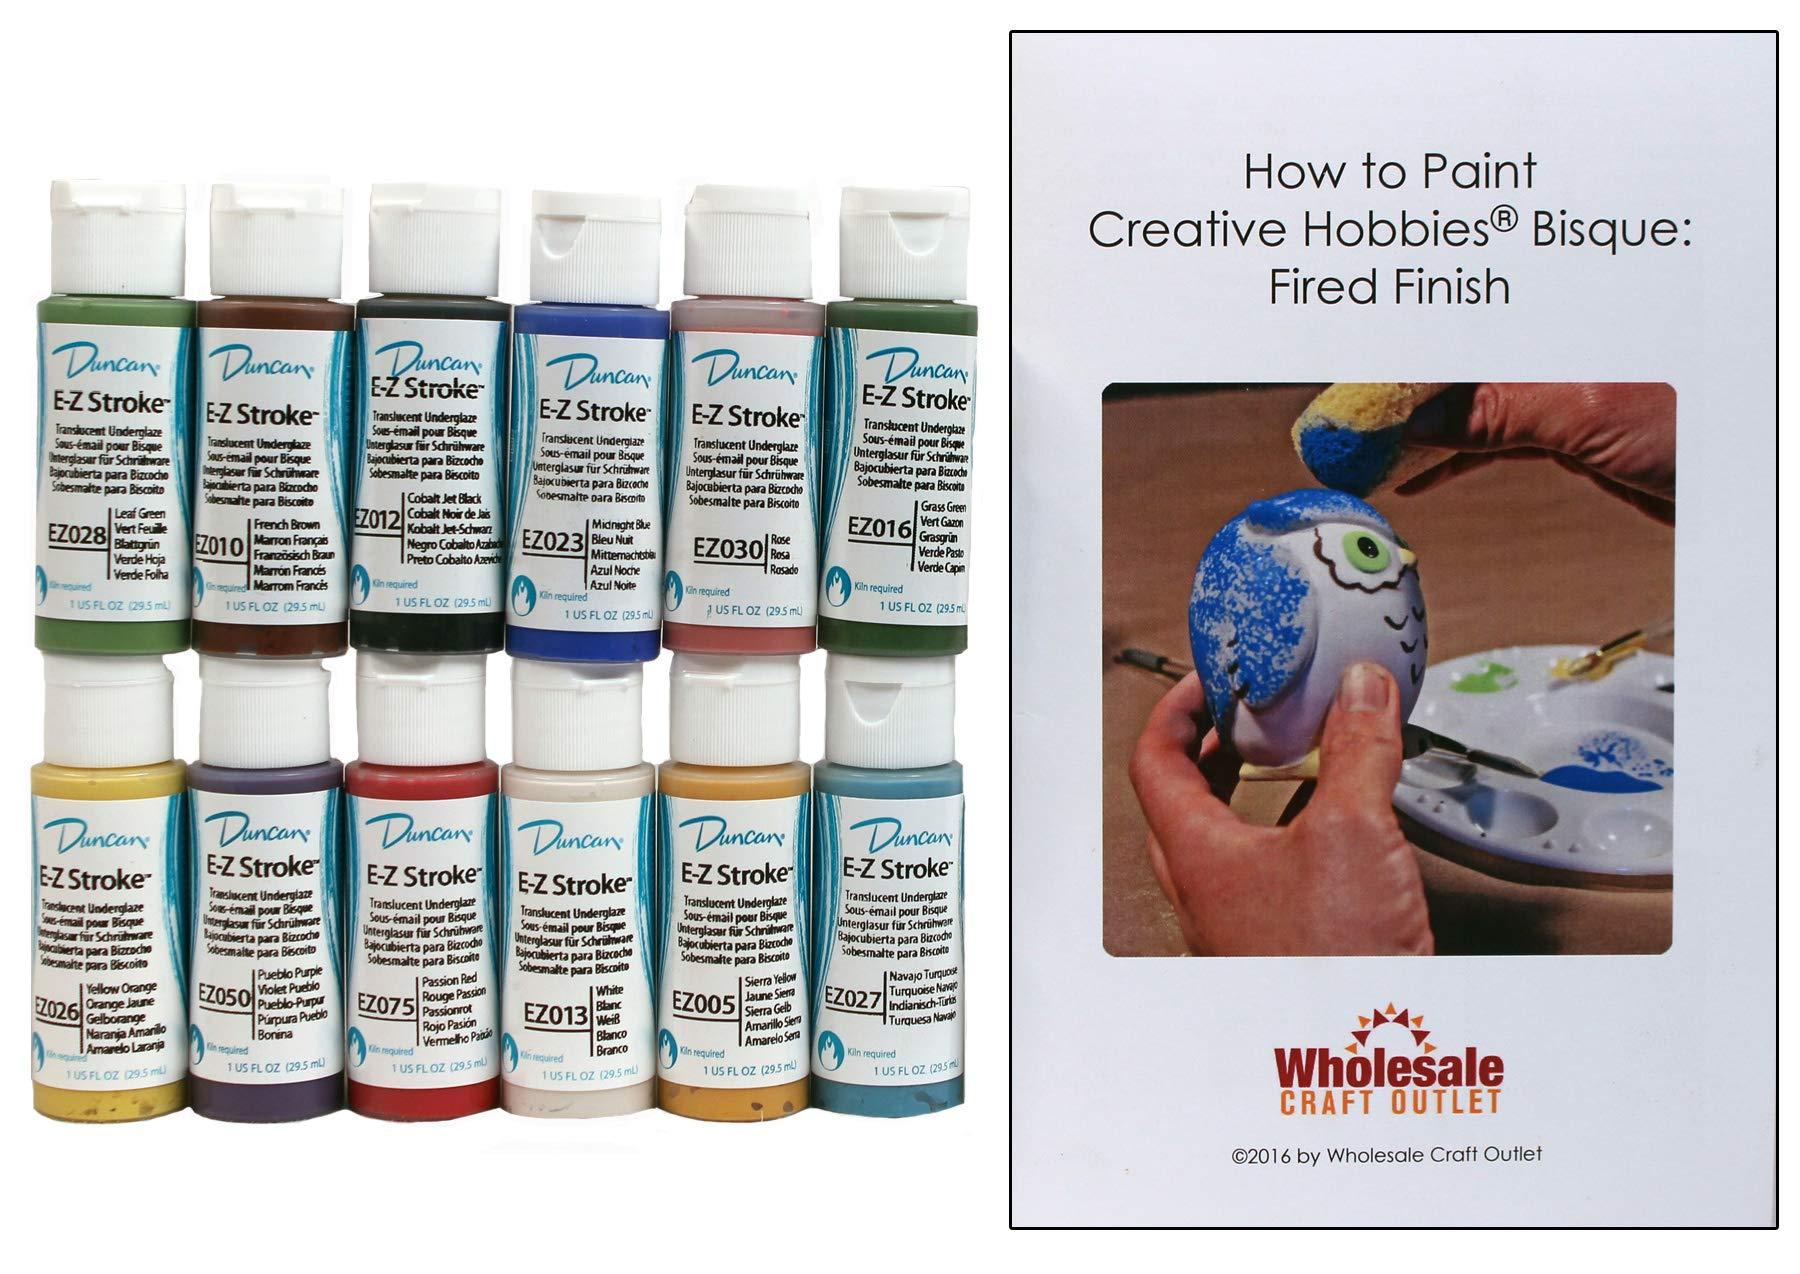 Duncan EZKIT-1 E-Z Stroke Translucent Underglaze Paint Set, 12 Best Selling Colors in 1 Ounce Bottles with Free How To Paint Ceramics Book